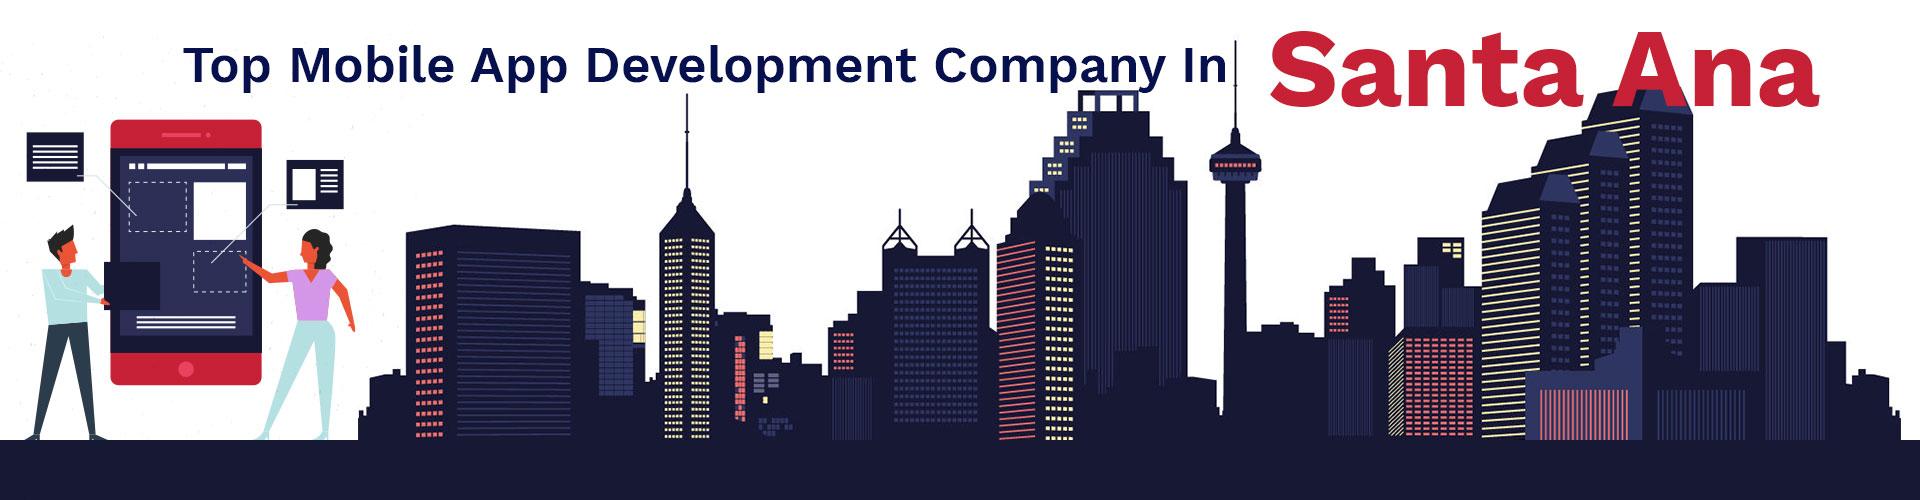 mobile app development company santa ana